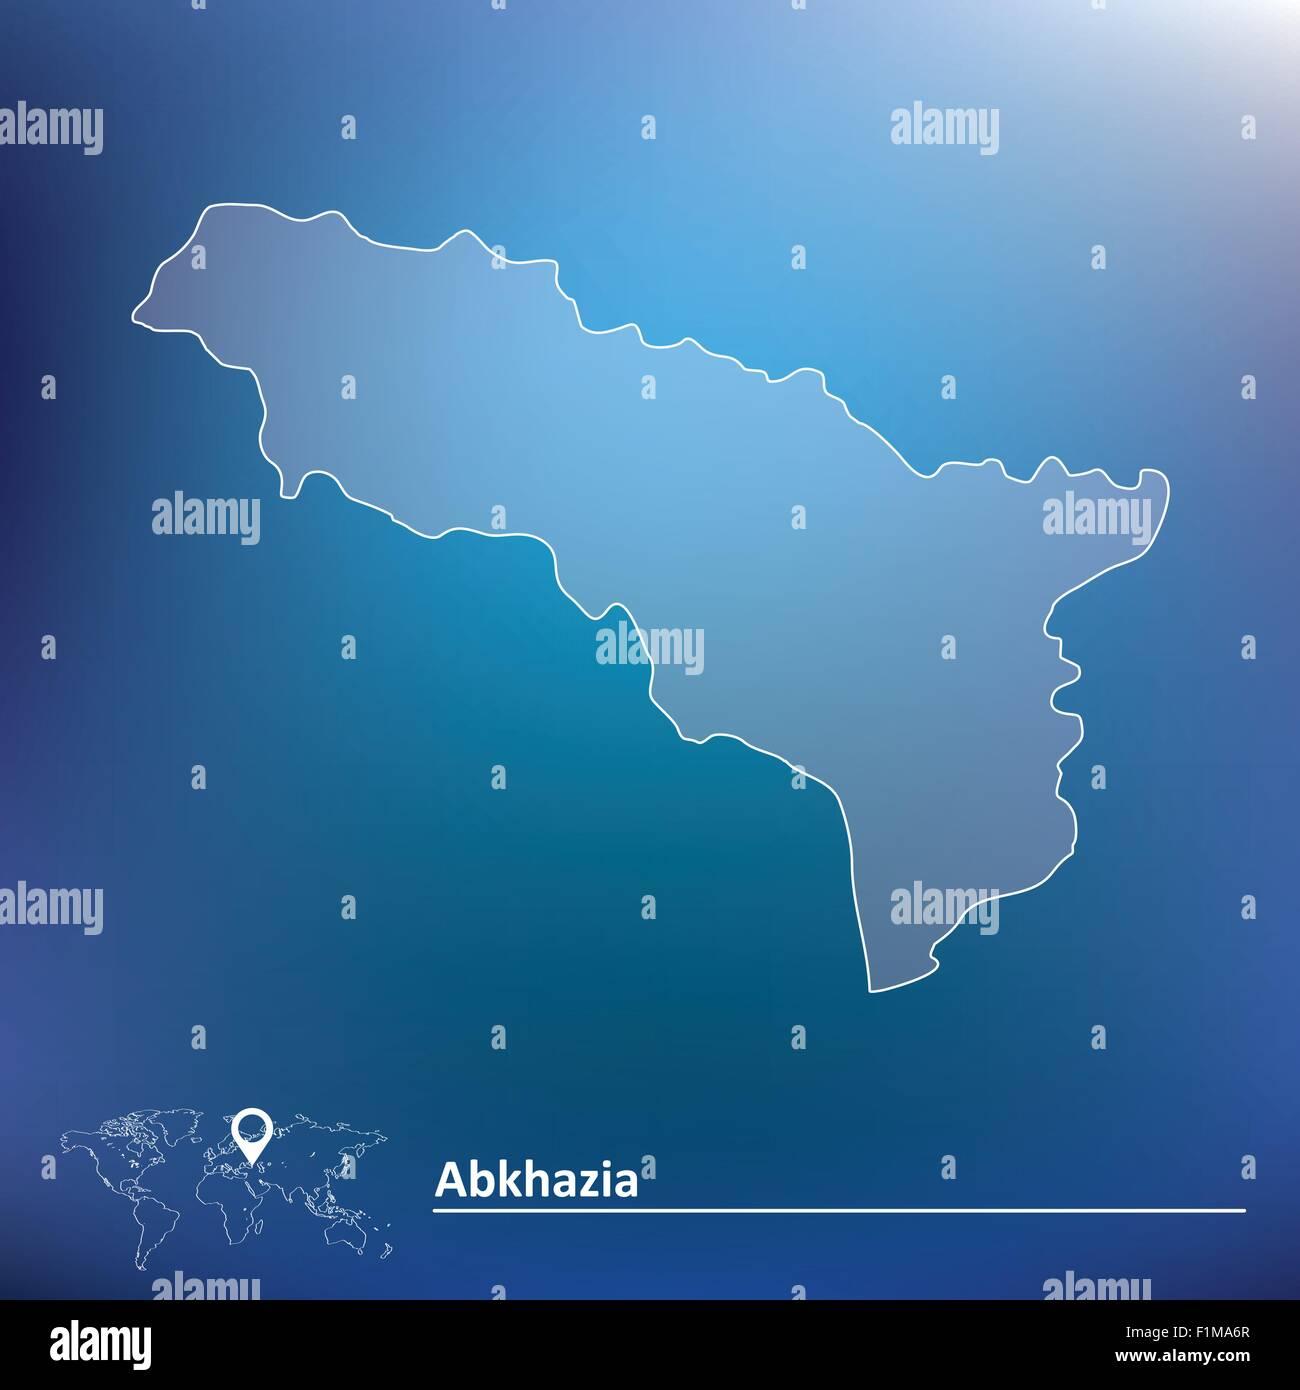 Map of Abkhazia - vector illustration - Stock Image